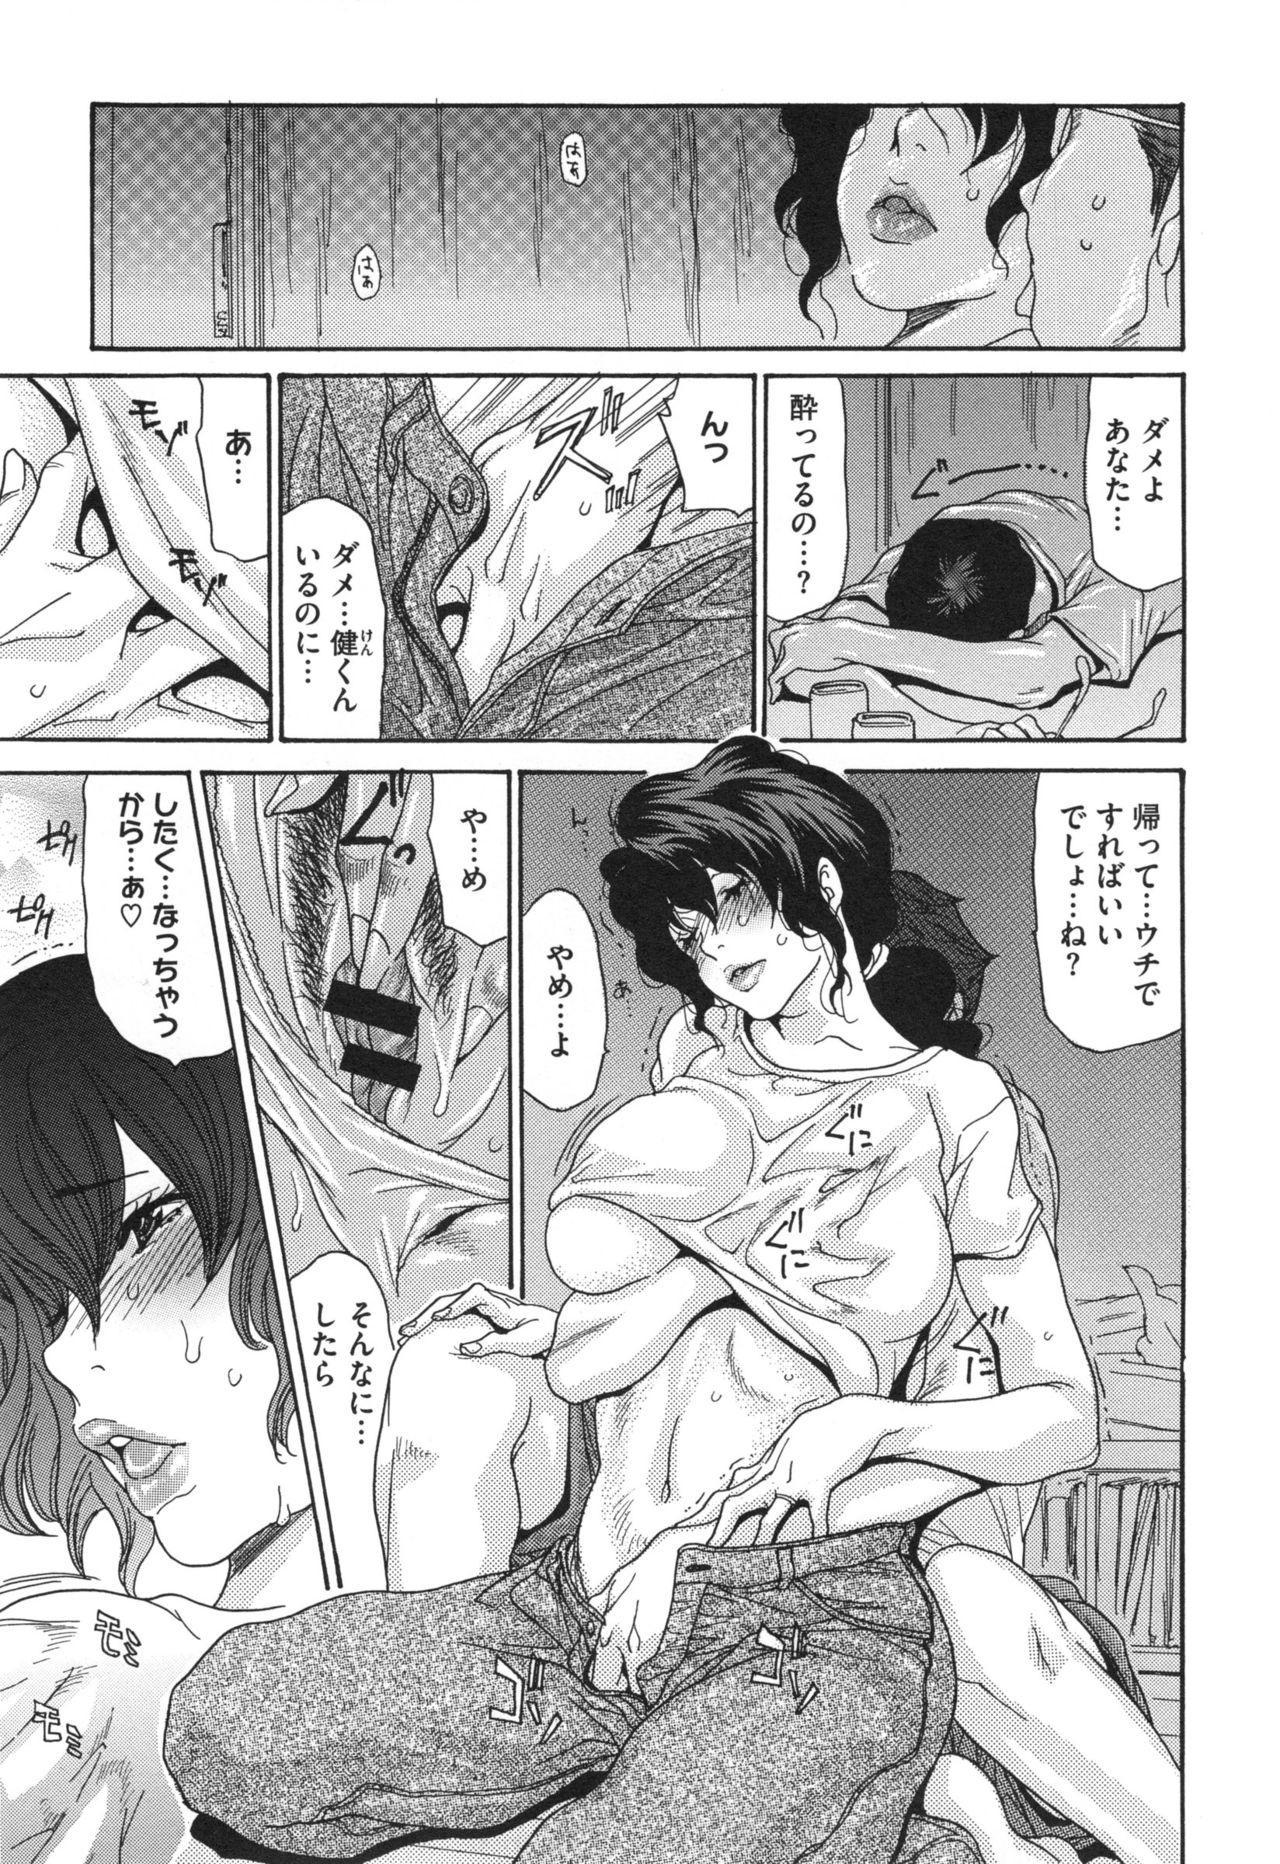 Niku-zuma Netorare Maniacs 89